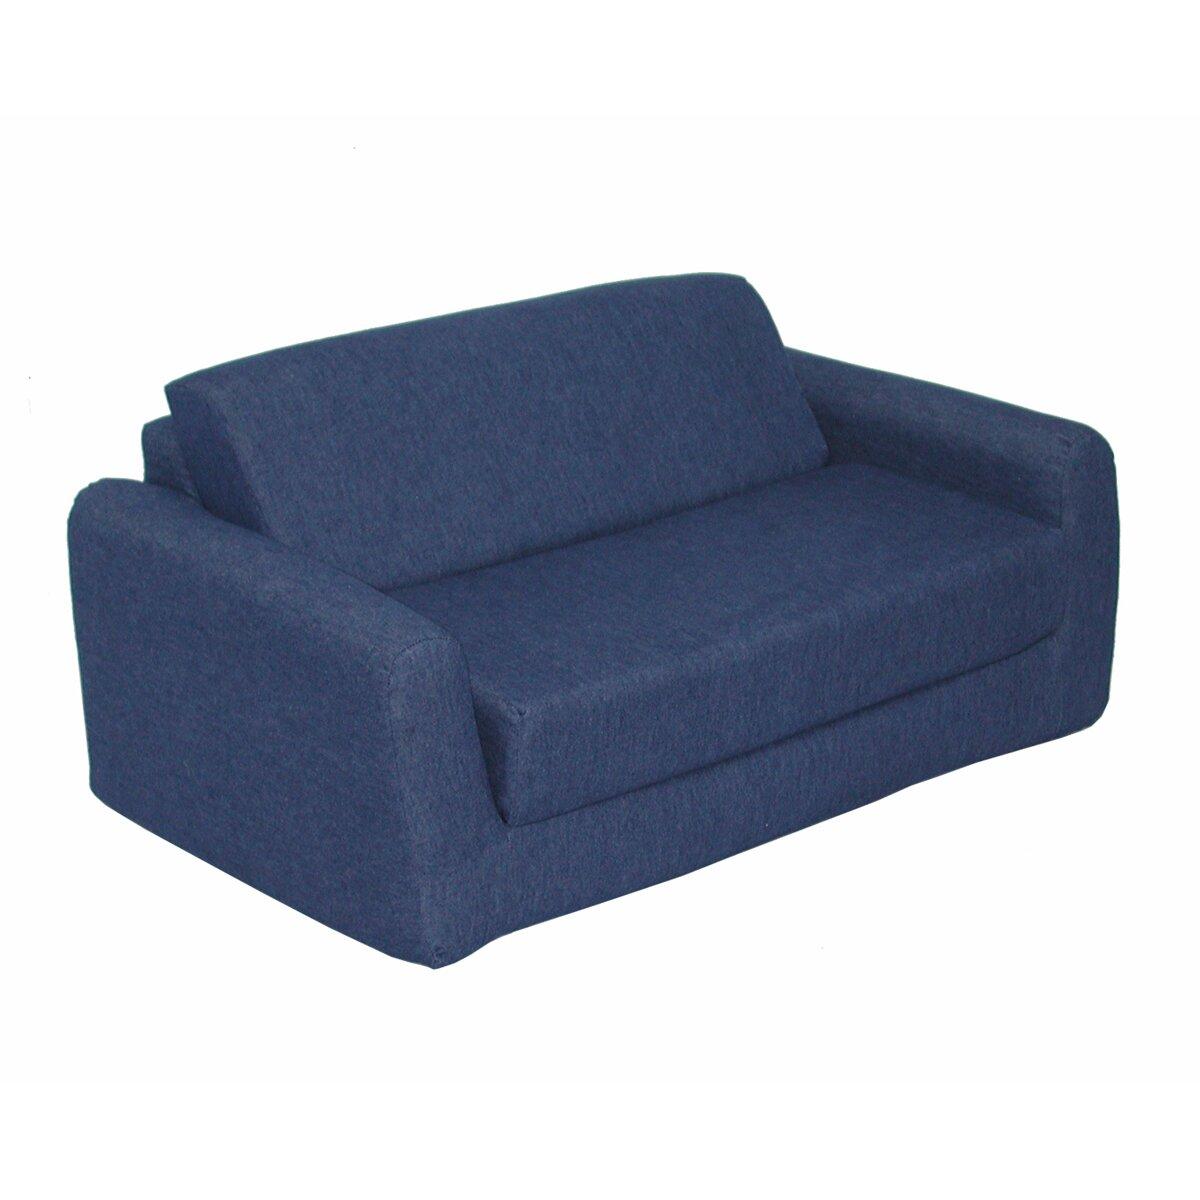 Elite Products Children 39 S Sofa Sleeper Reviews Wayfair